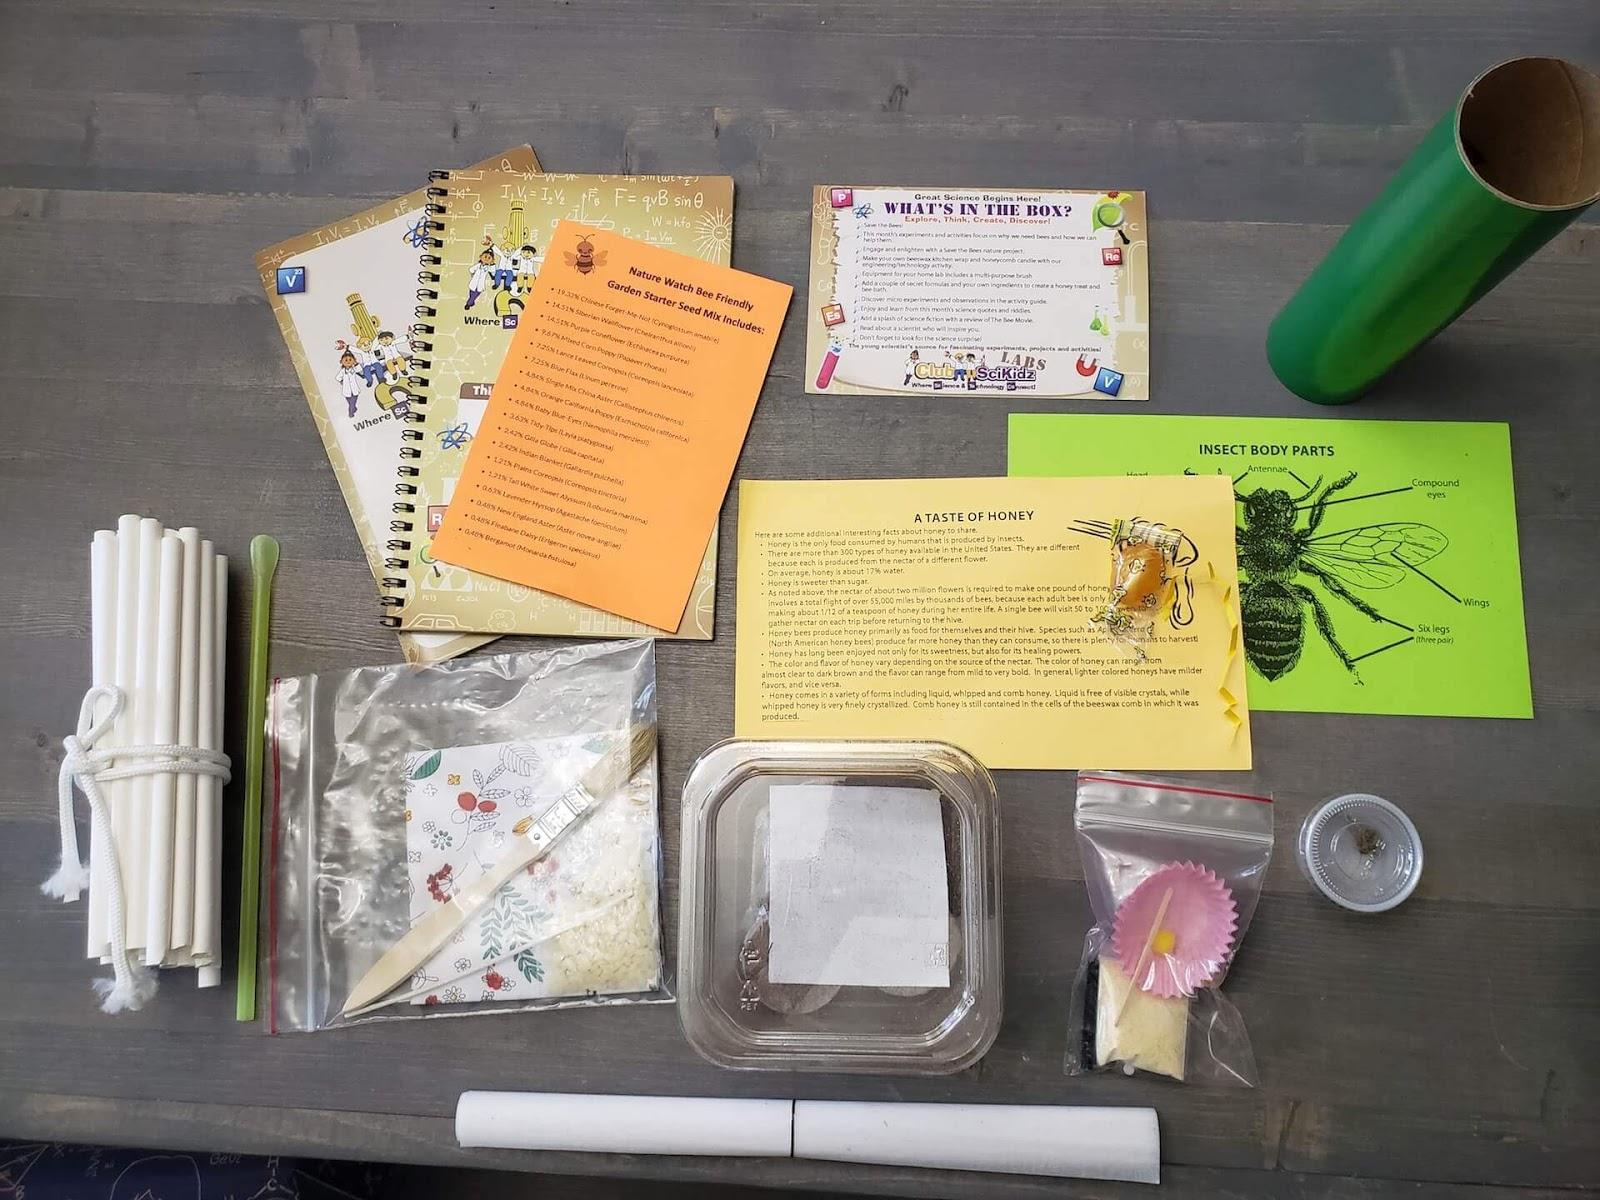 SciKidz Save the Bees box